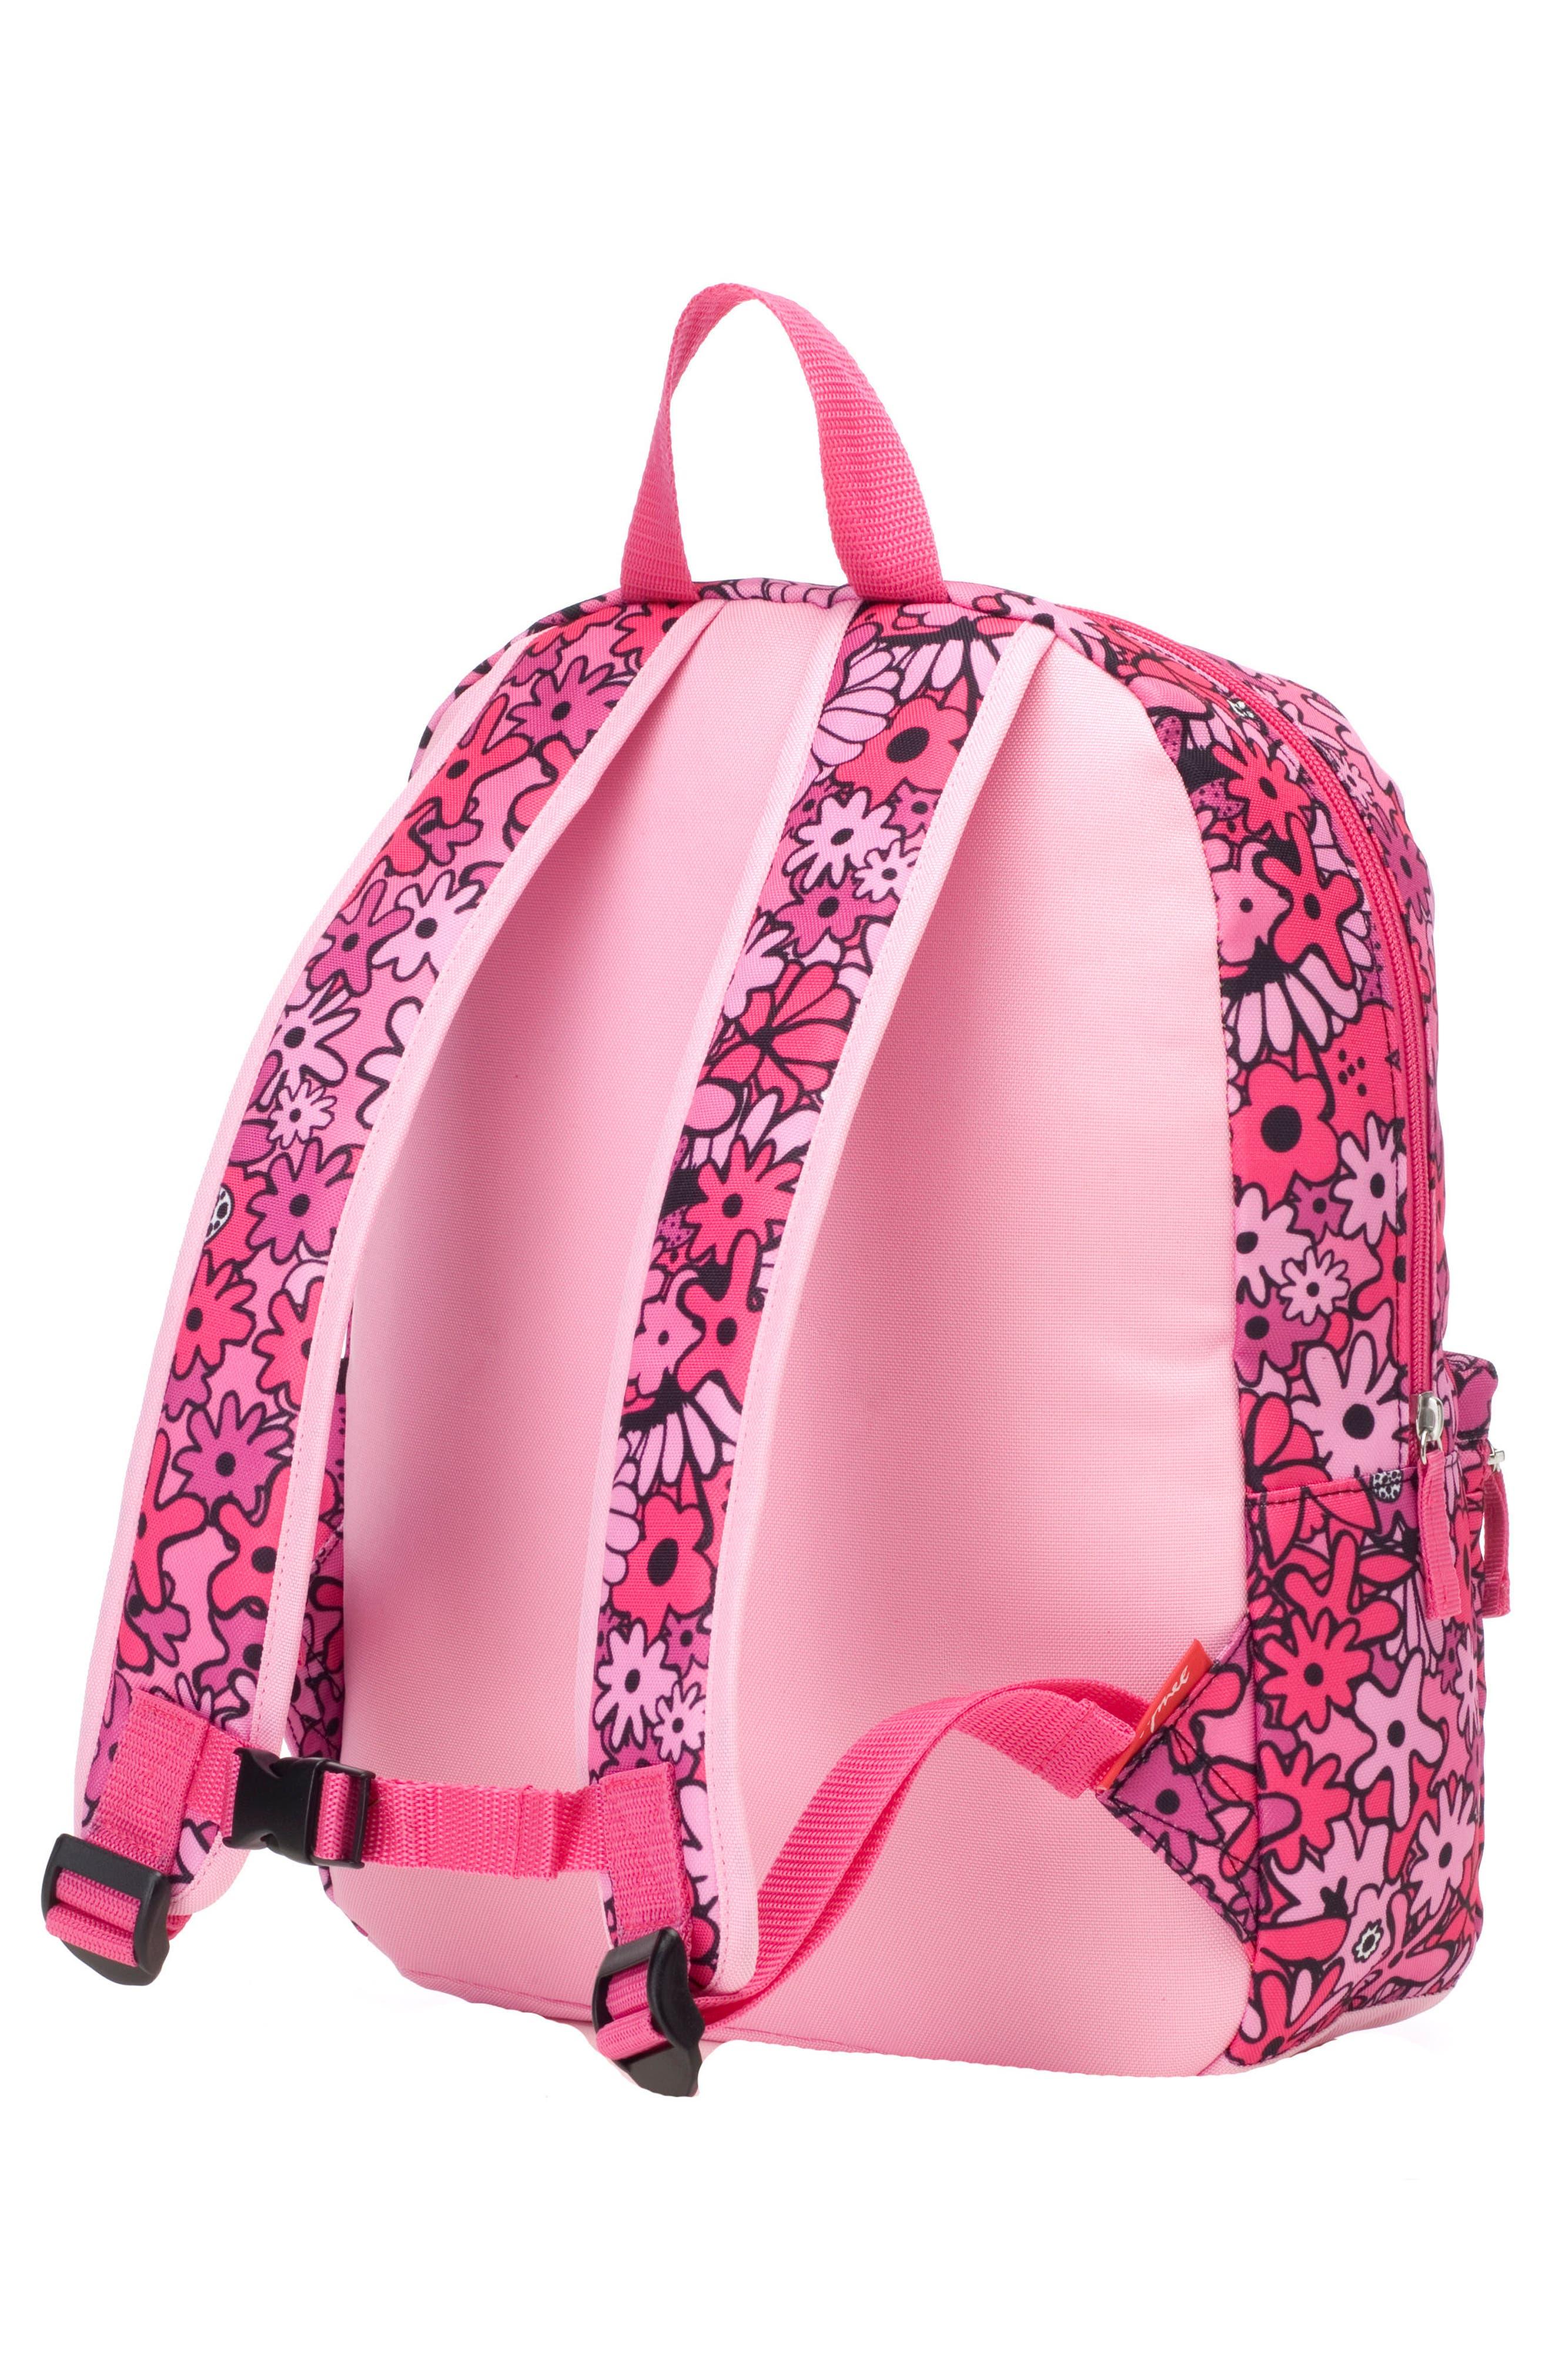 Zip & Zoe Floral Junior Backpack,                             Alternate thumbnail 2, color,                             FLORAL PINK